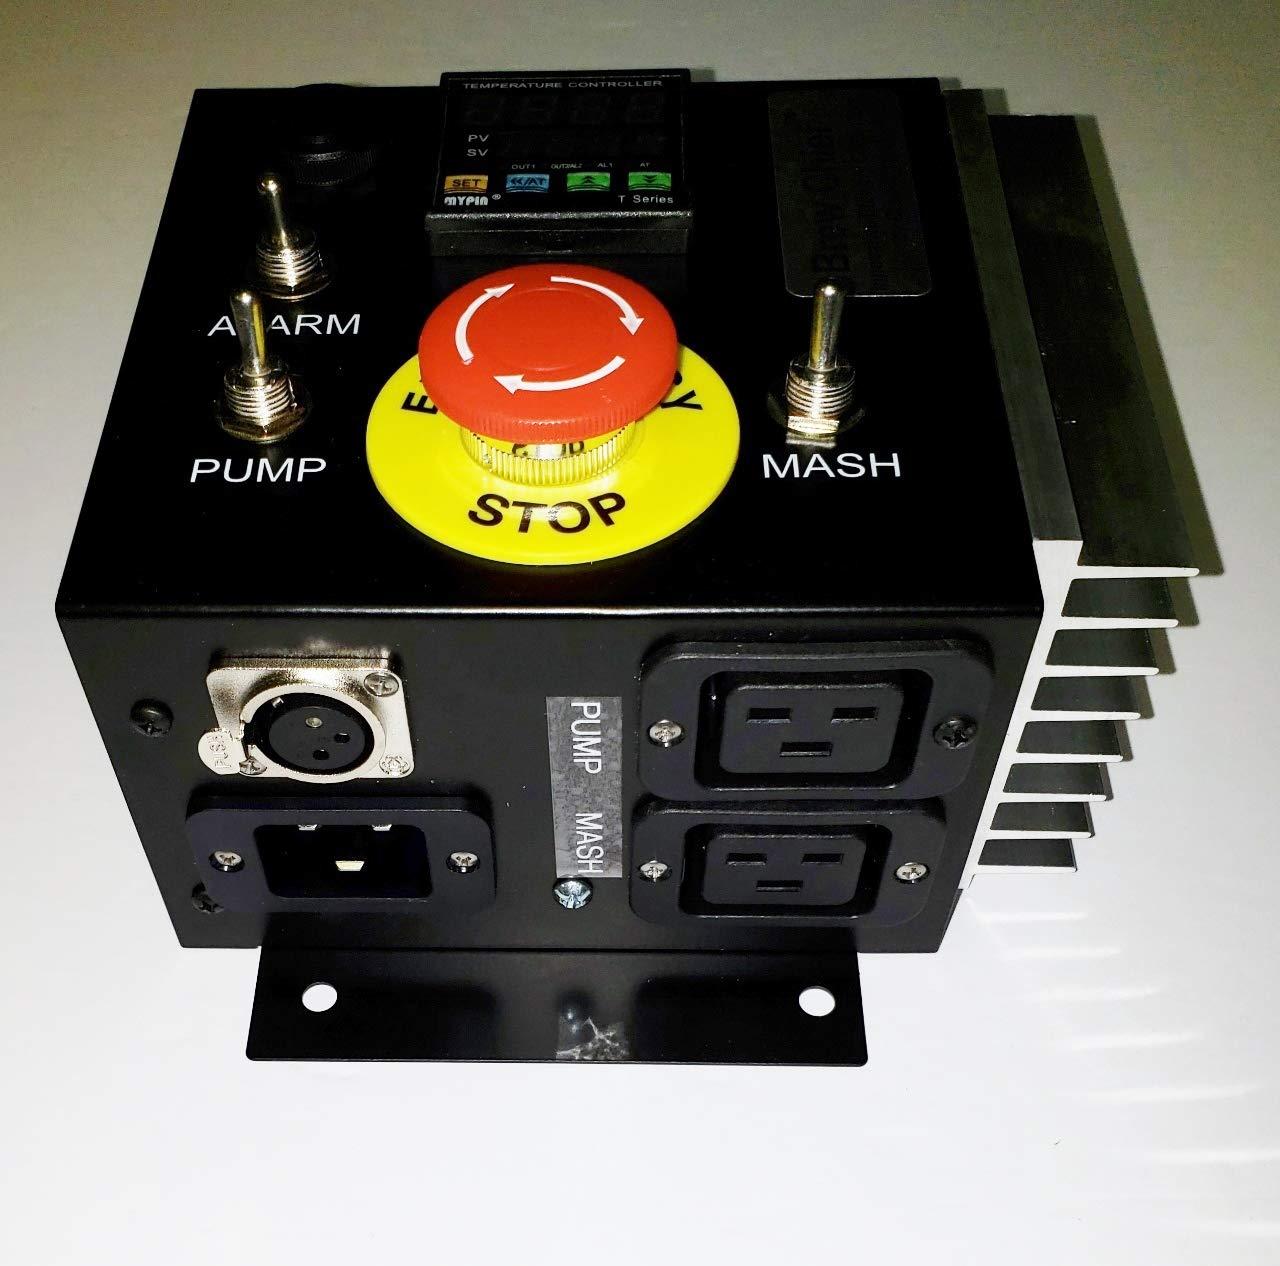 International 220/230/240v 50/60 Hz Mash Tun/RIMS (Recirculating Infusion Mash System) Tube Controller by Stir-Plate (Image #3)